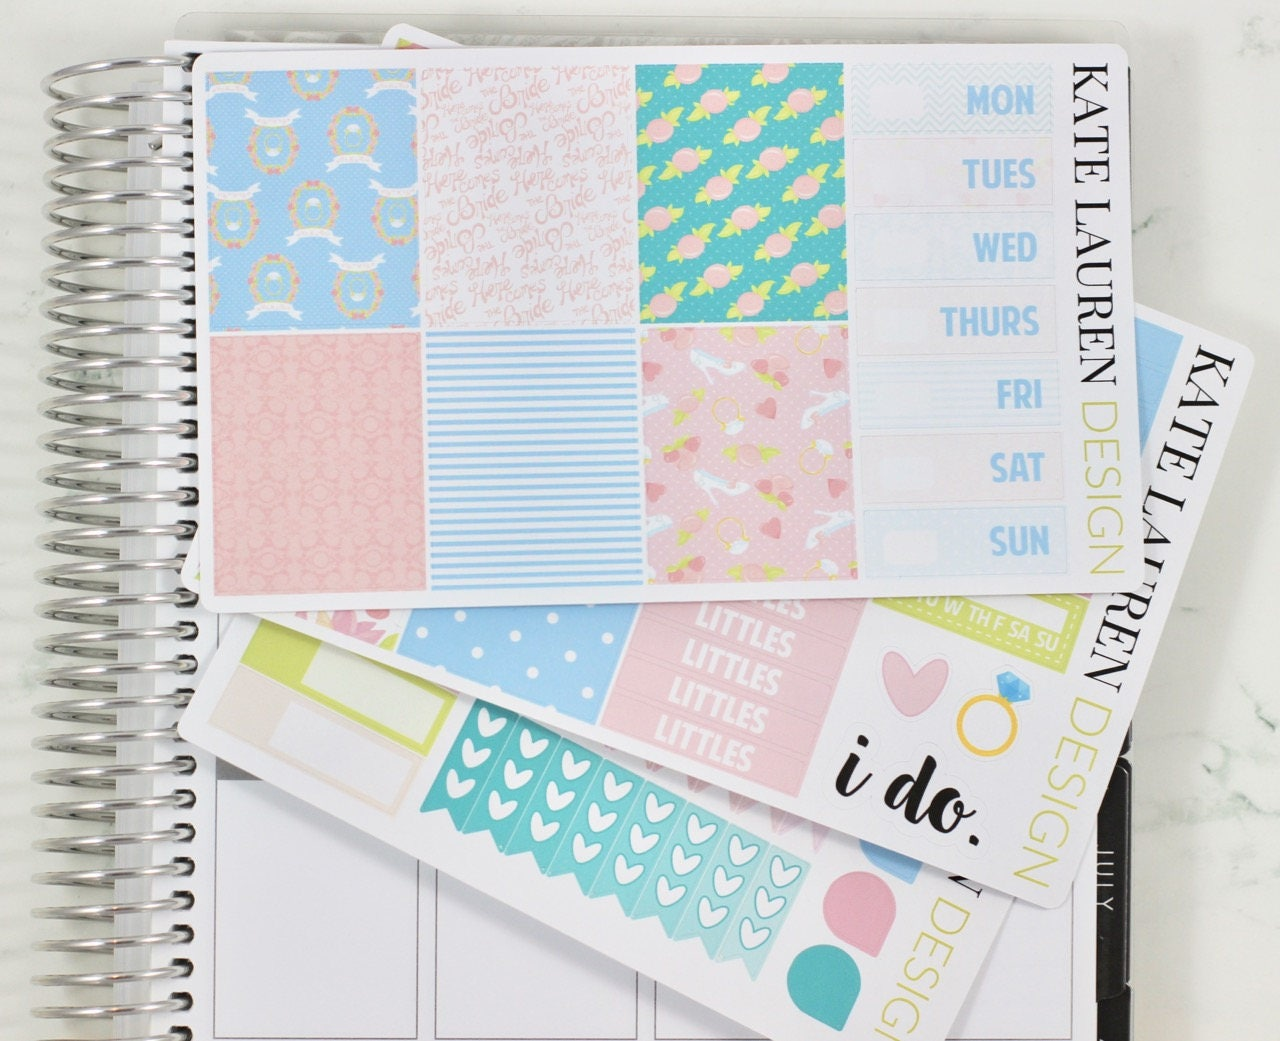 Erin Condren Wedding Planner.Wedding Planner Stickers Wedding Kit For The Erin Condren Life Planner Vertical Wedding Planner Kit Wedding Sticker Kit